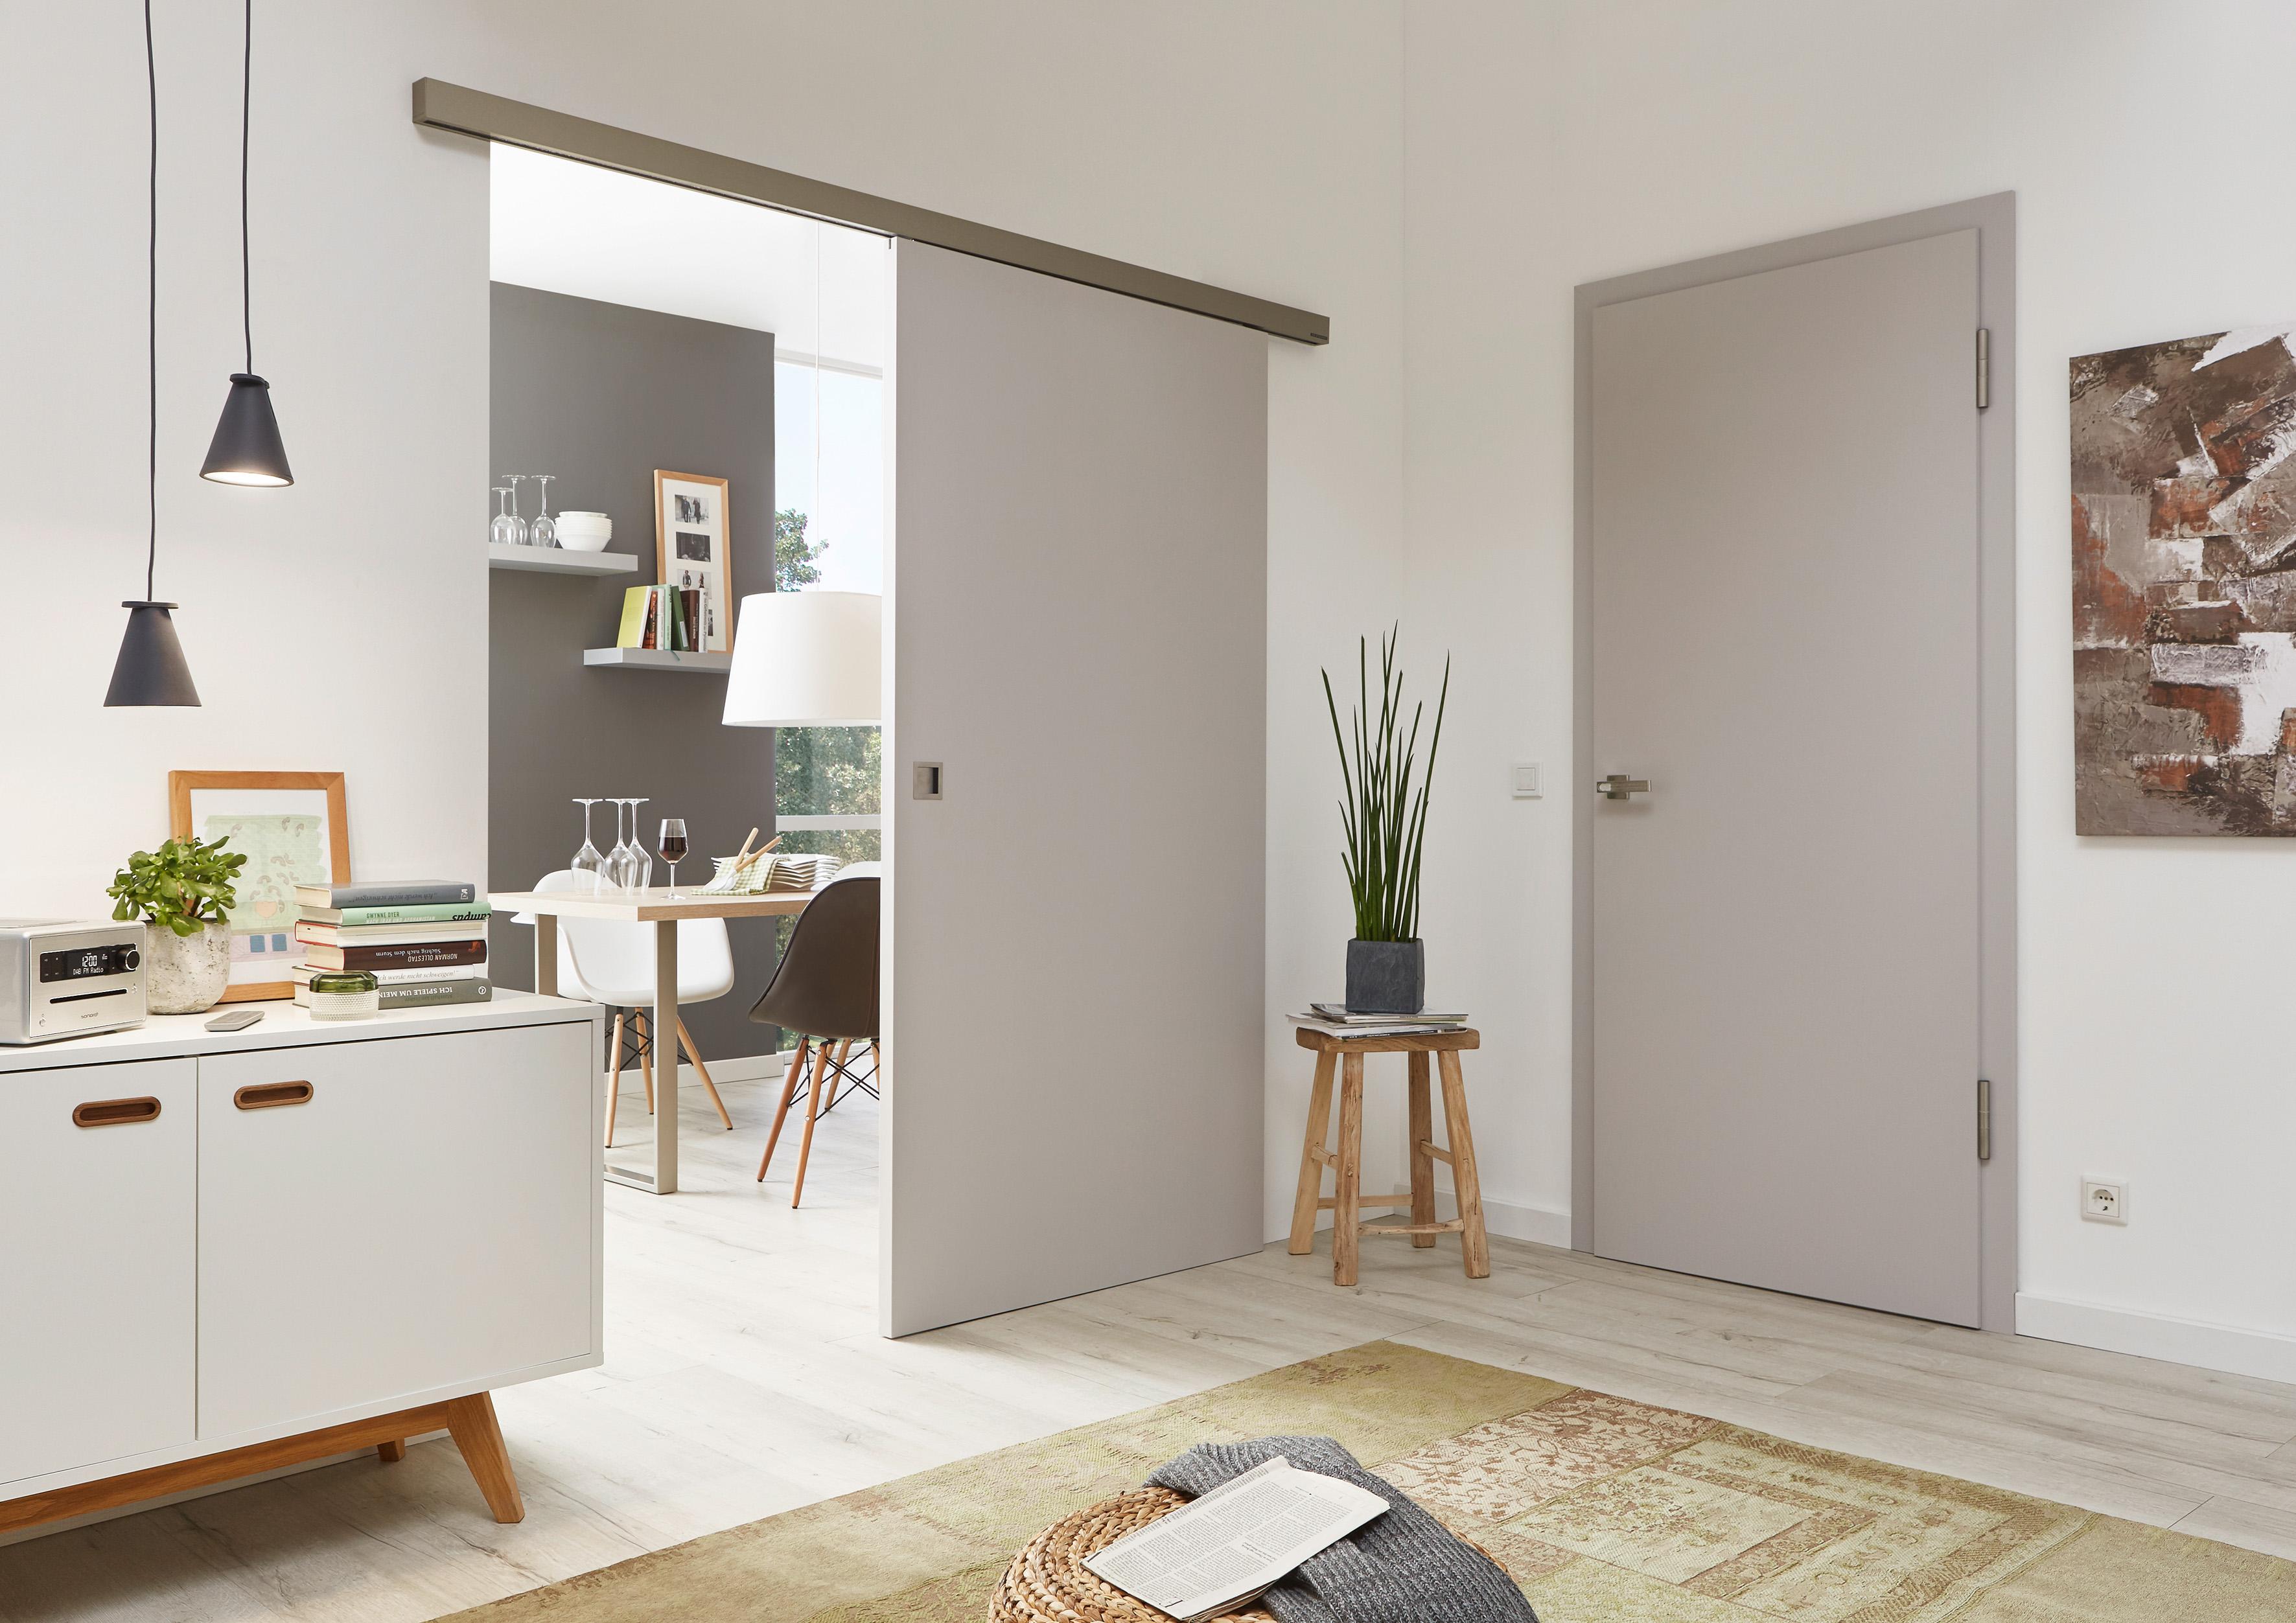 100 furniture white inside doors pre how to spray. Black Bedroom Furniture Sets. Home Design Ideas